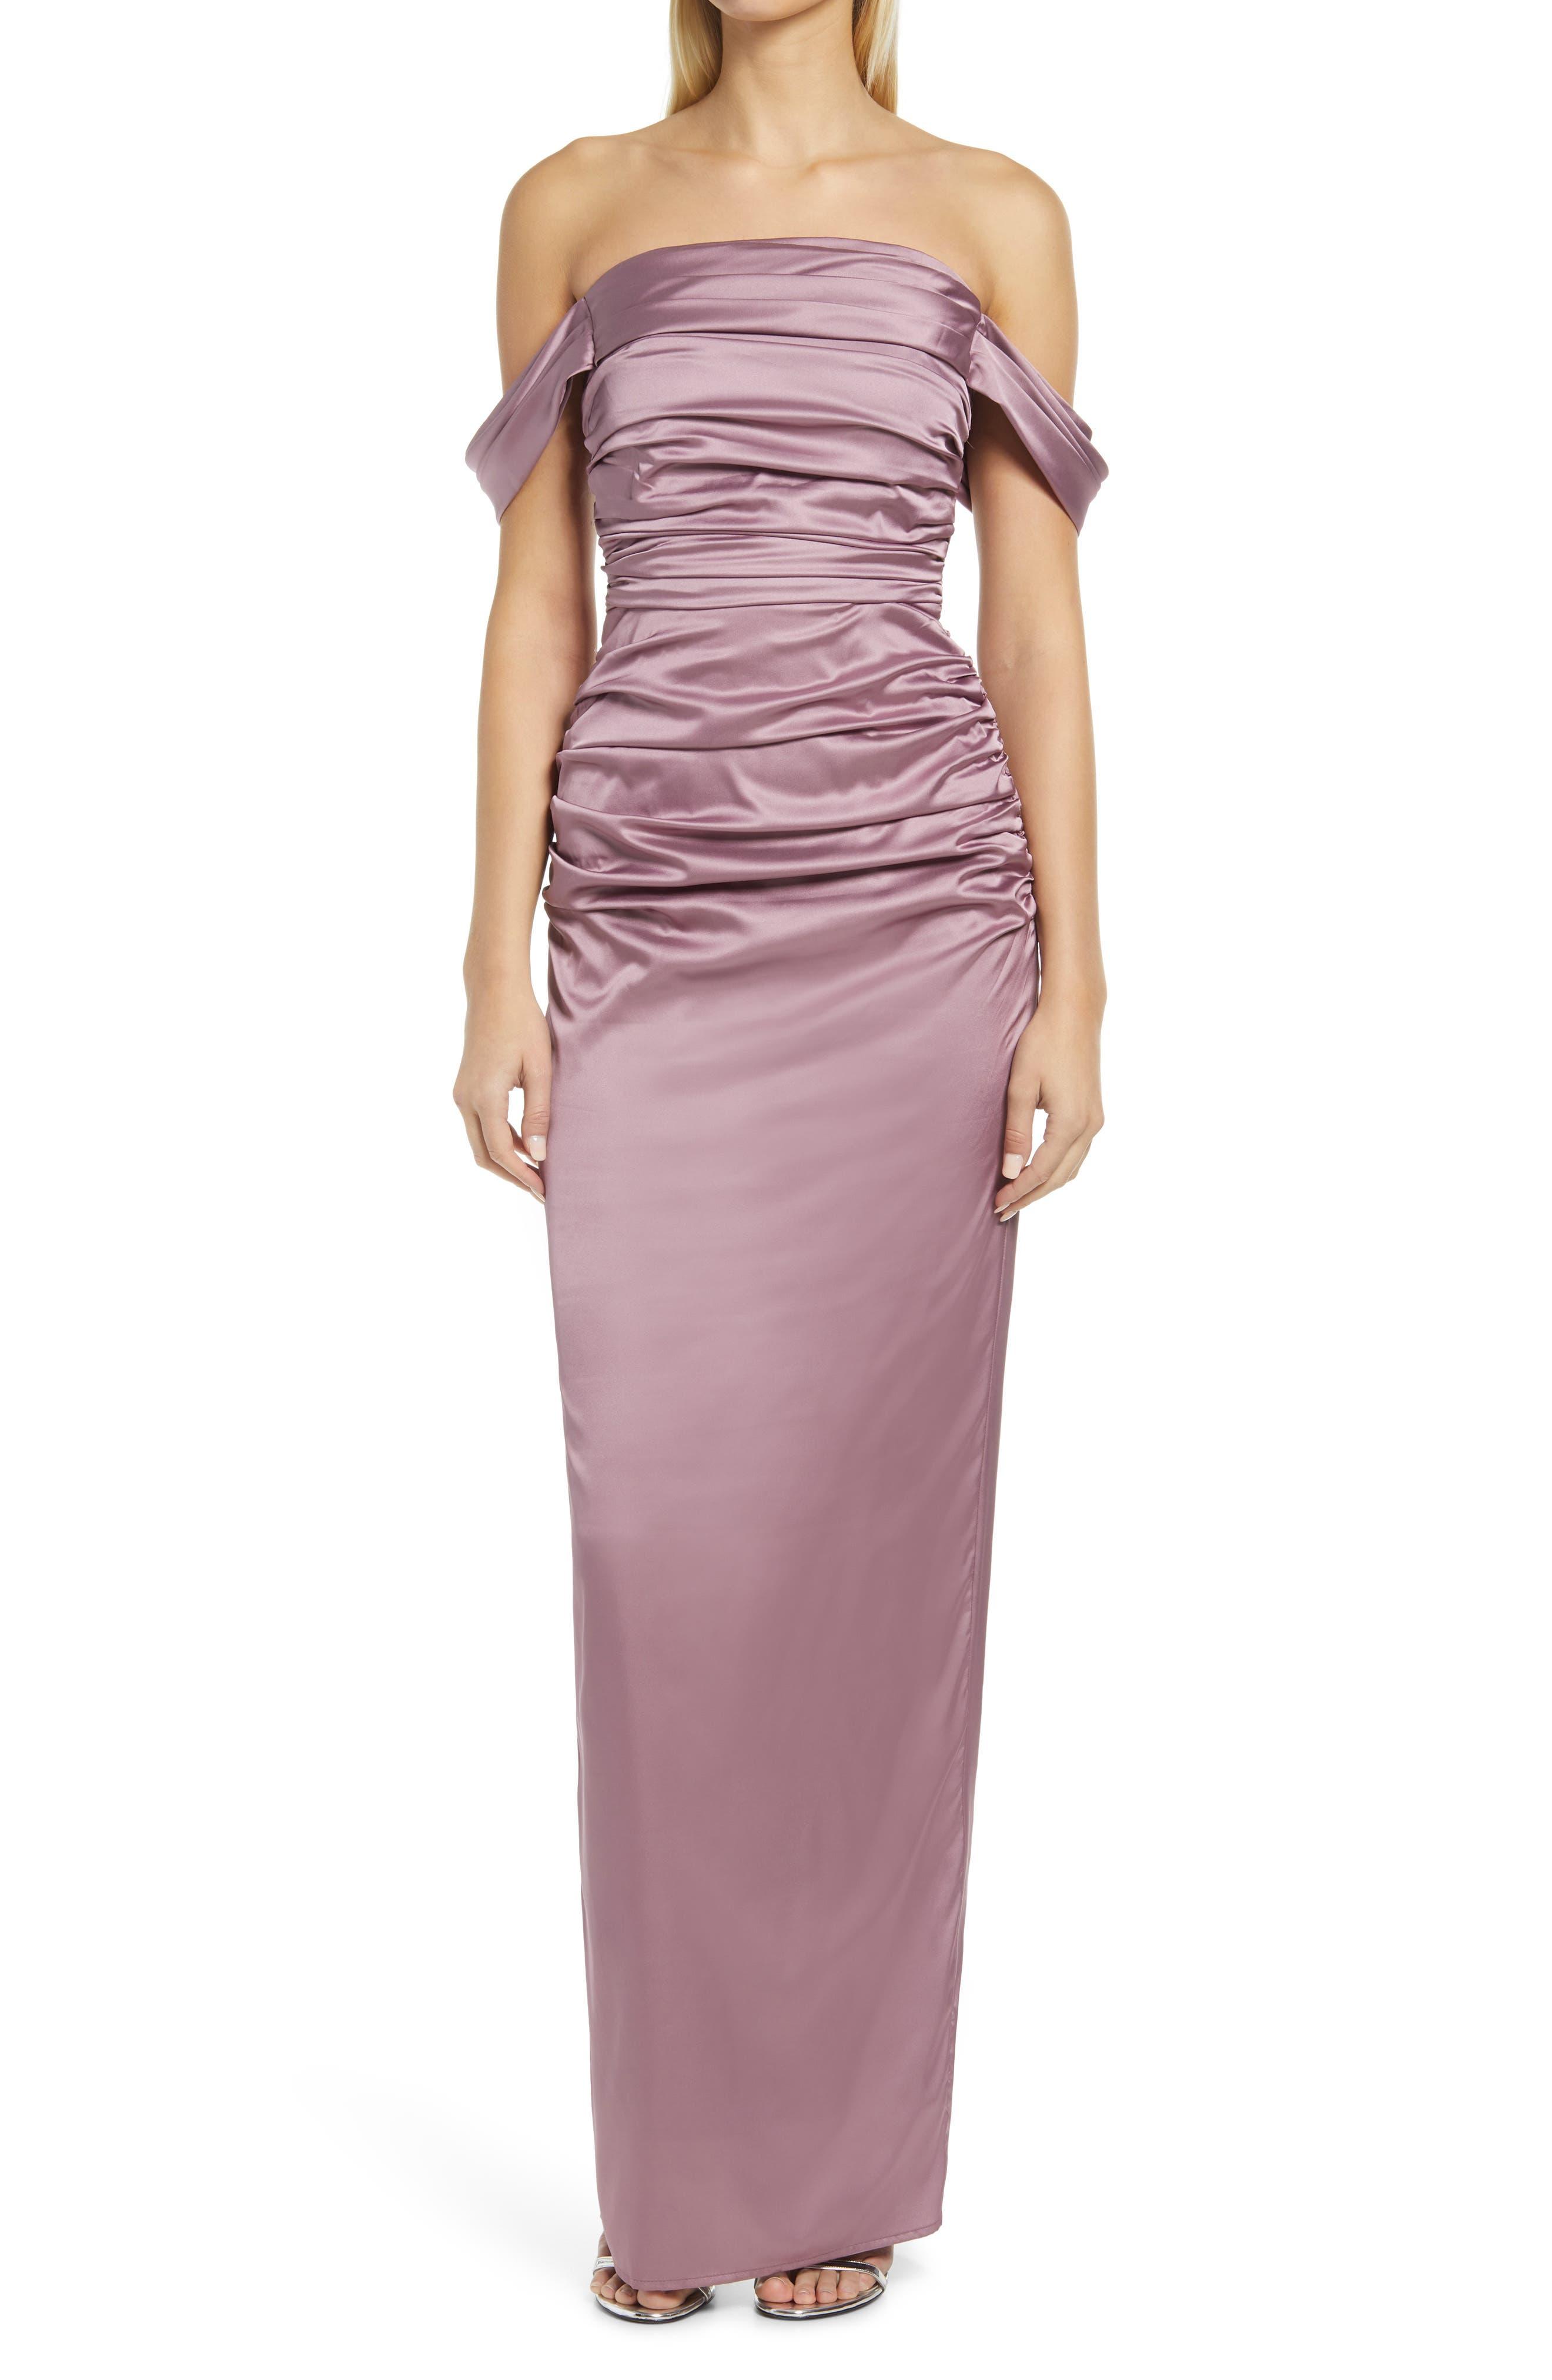 Bardot Off The Shoulder Bridesmaid Dress